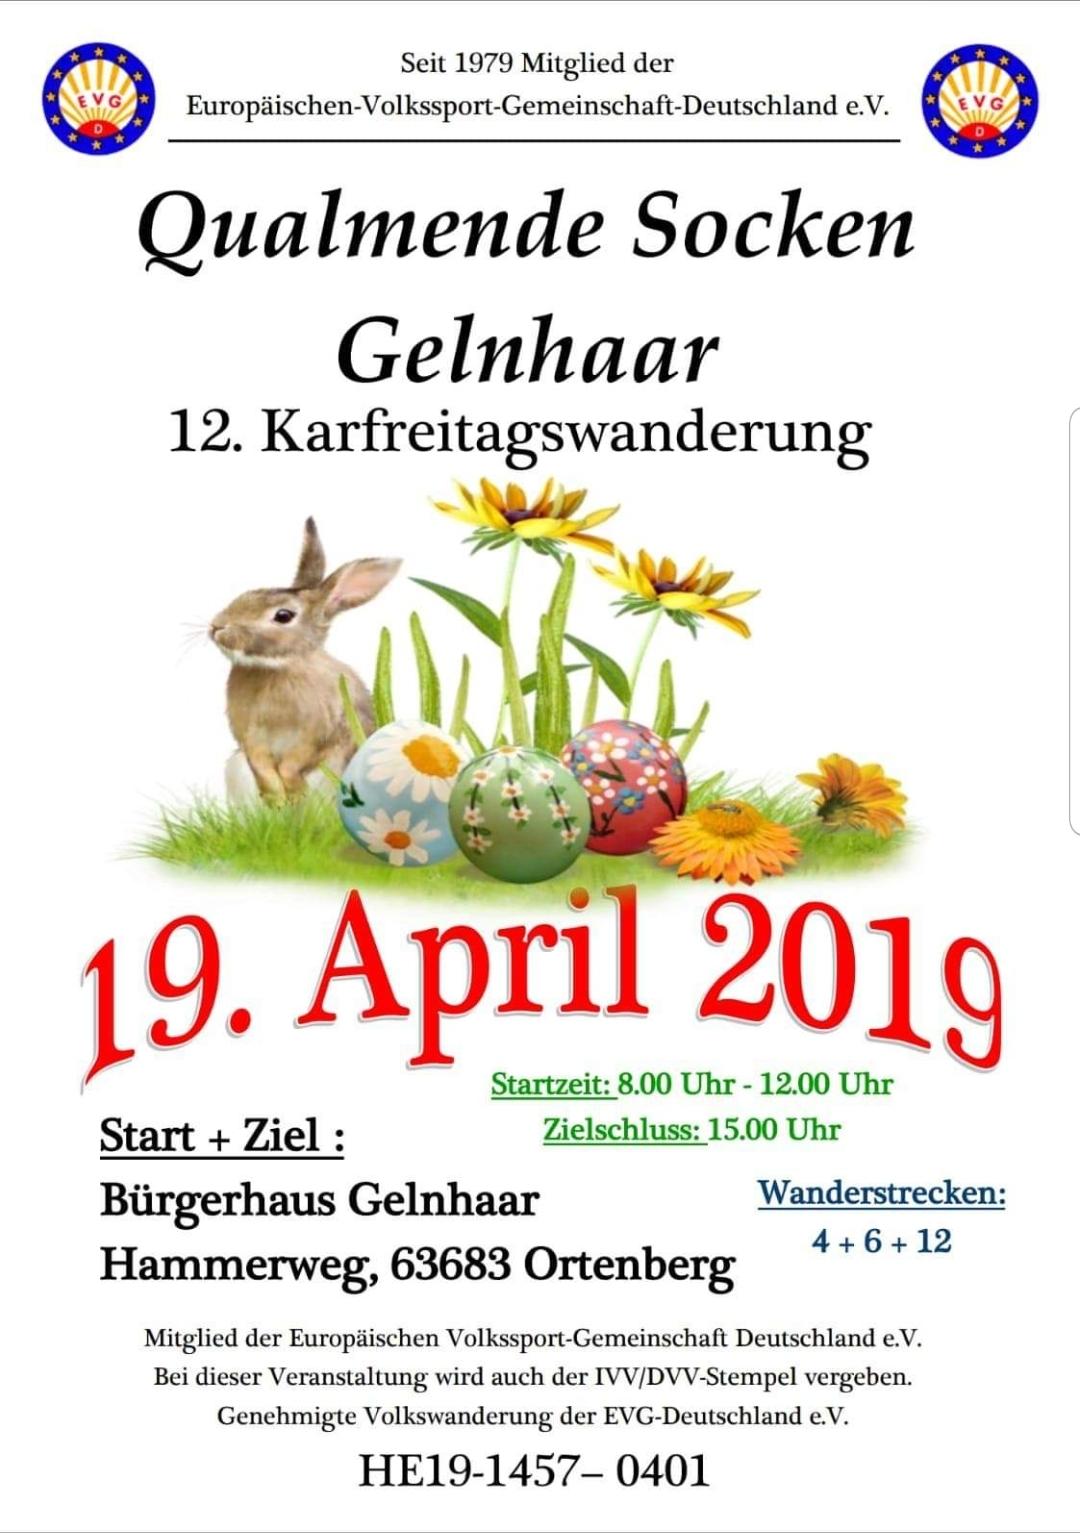 Ausschreibung_20190419_Gelnhaar